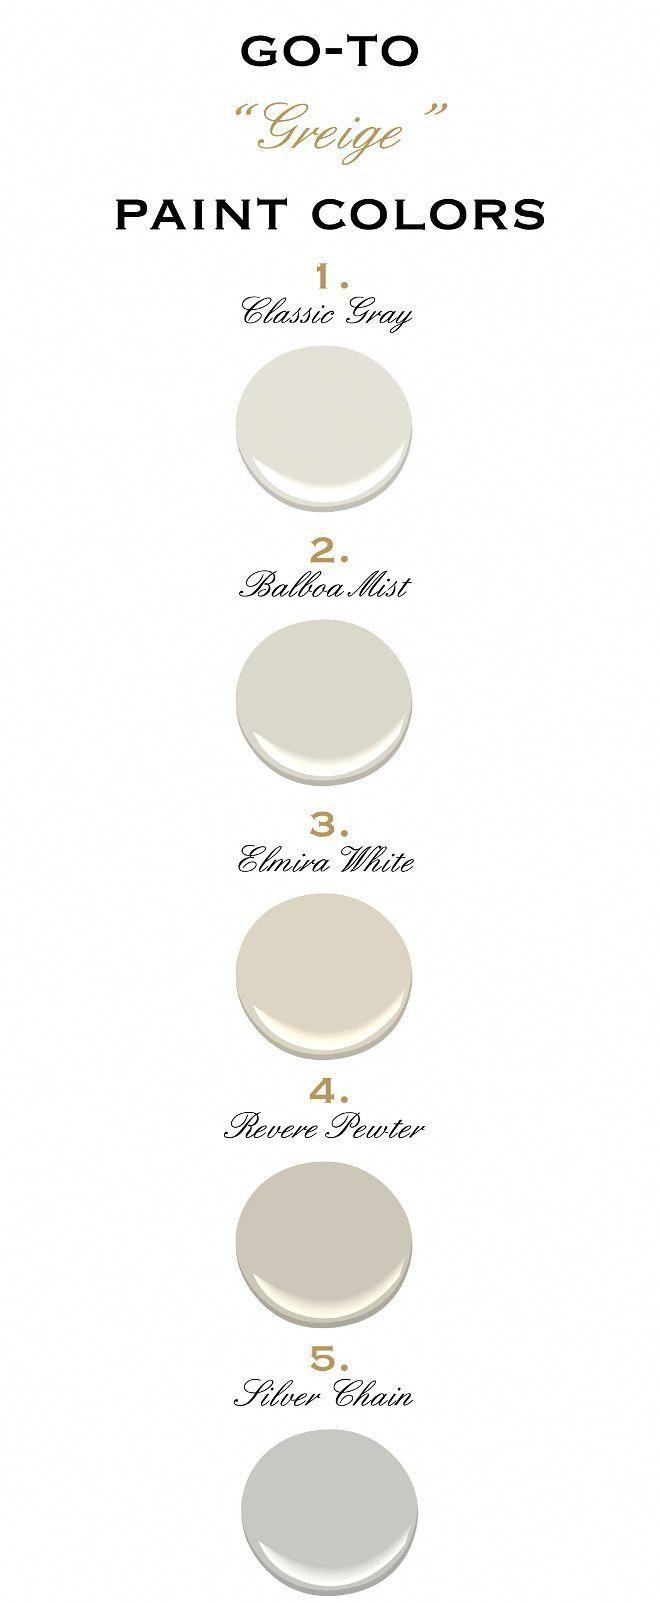 Top greige paint colors by benjamin moore benjamin moore classic